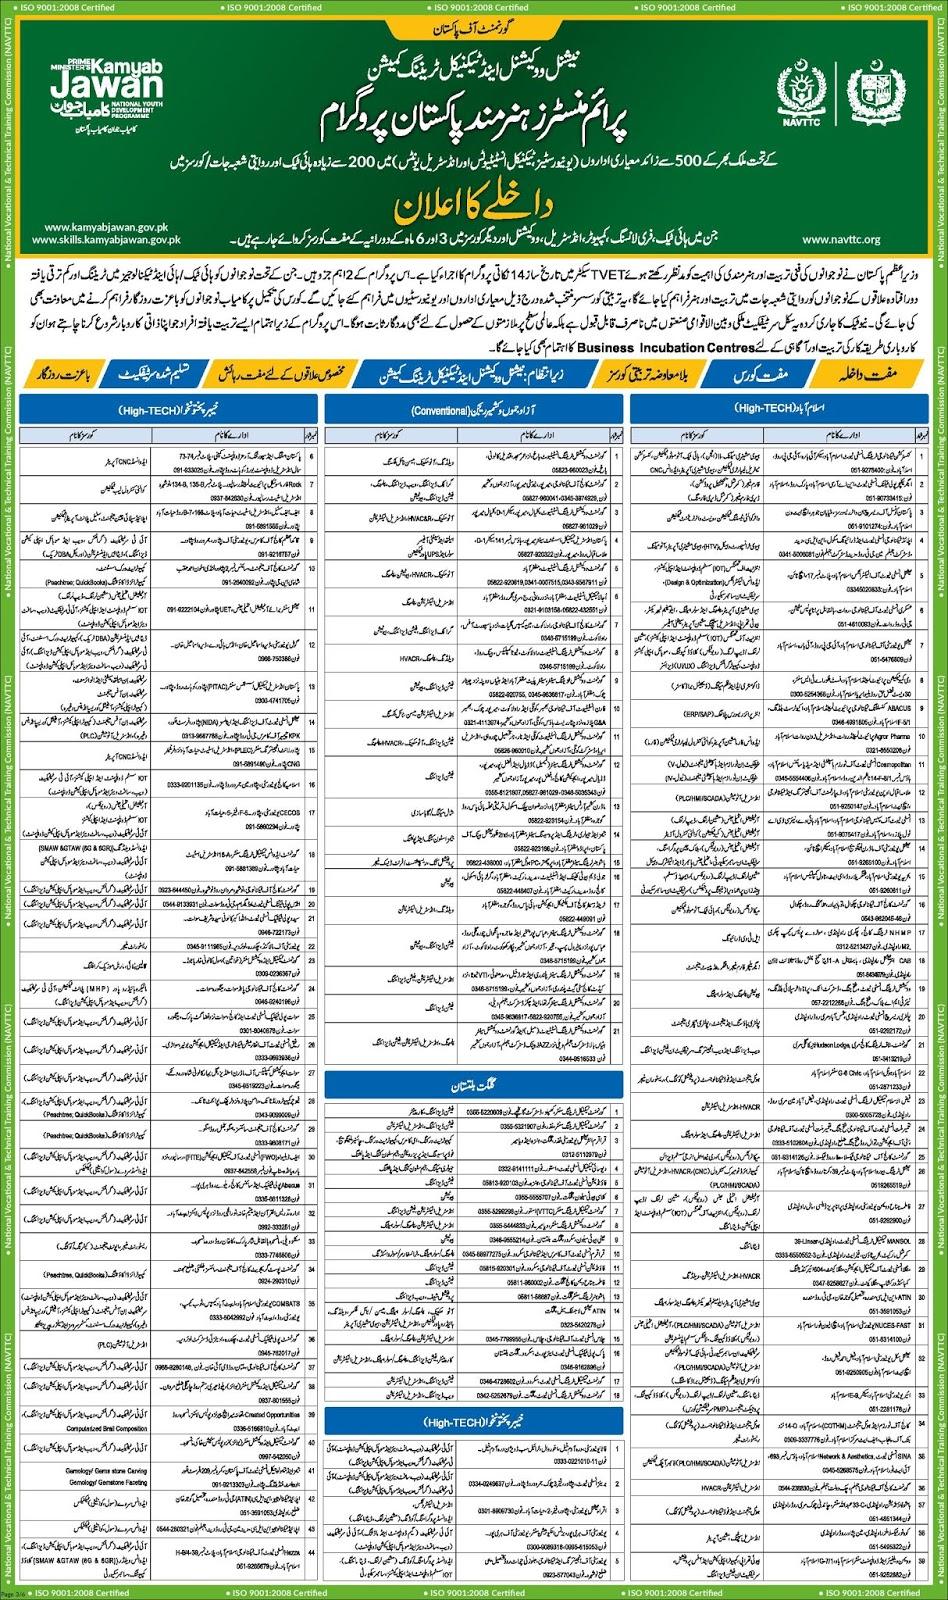 Jobs in Pakistan